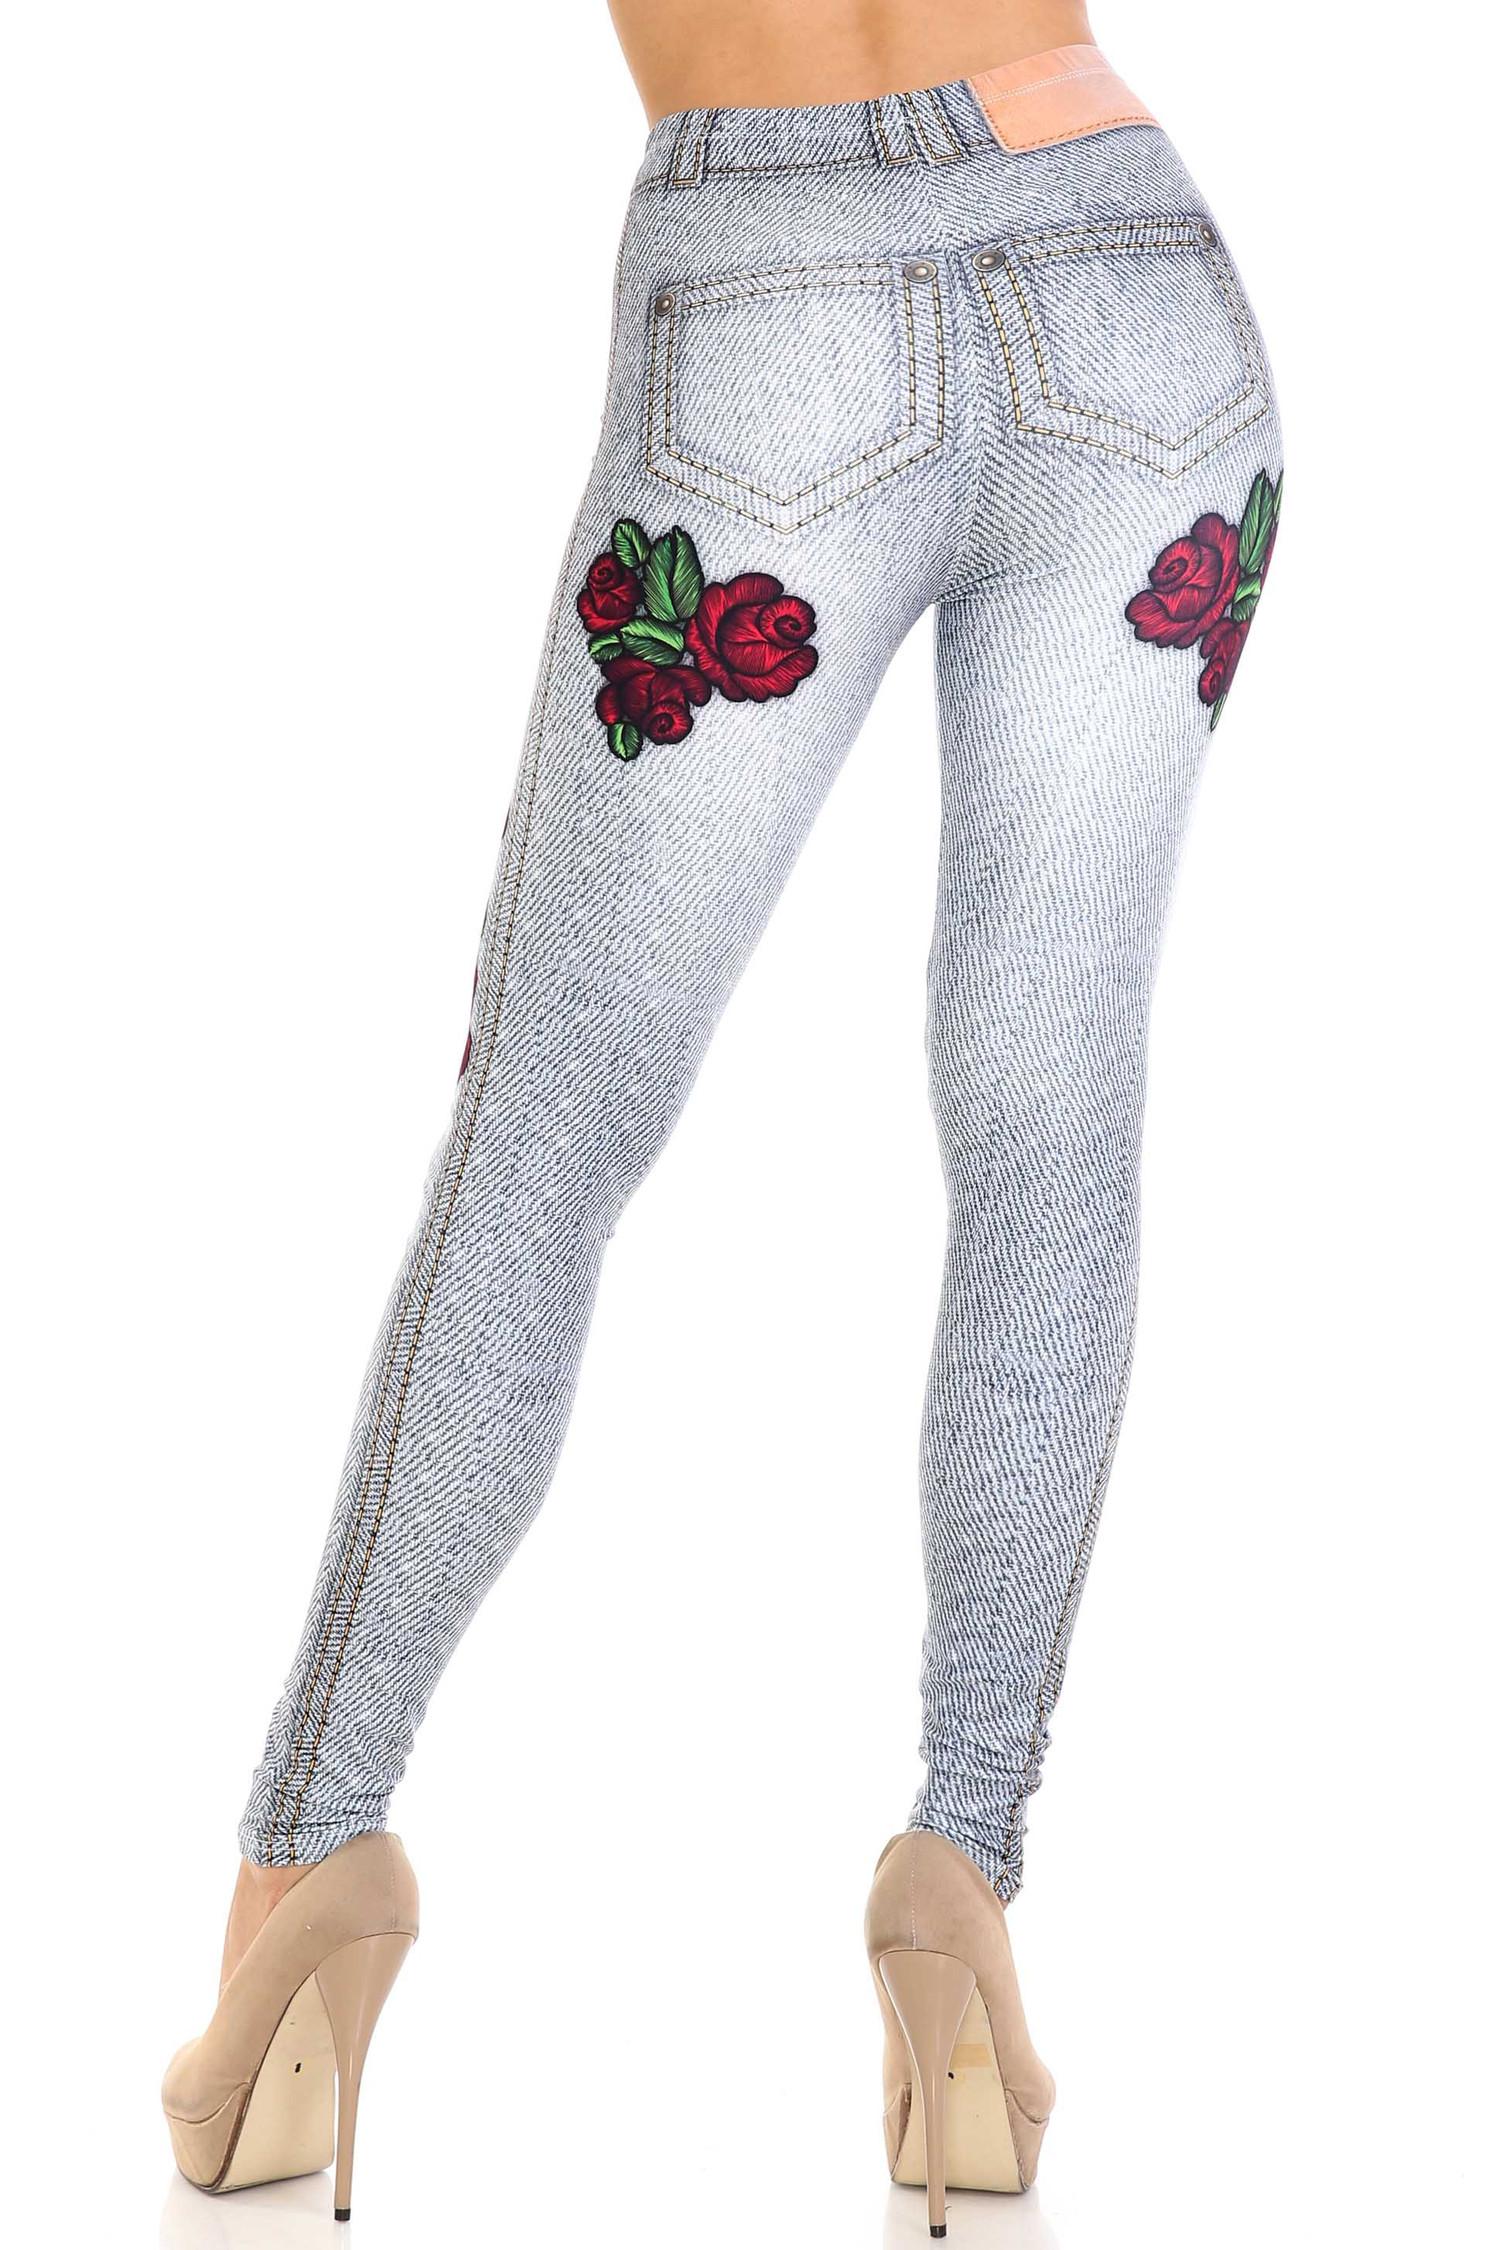 Creamy Soft Light Blue Denim Rose Leggings - By USA Fashion™